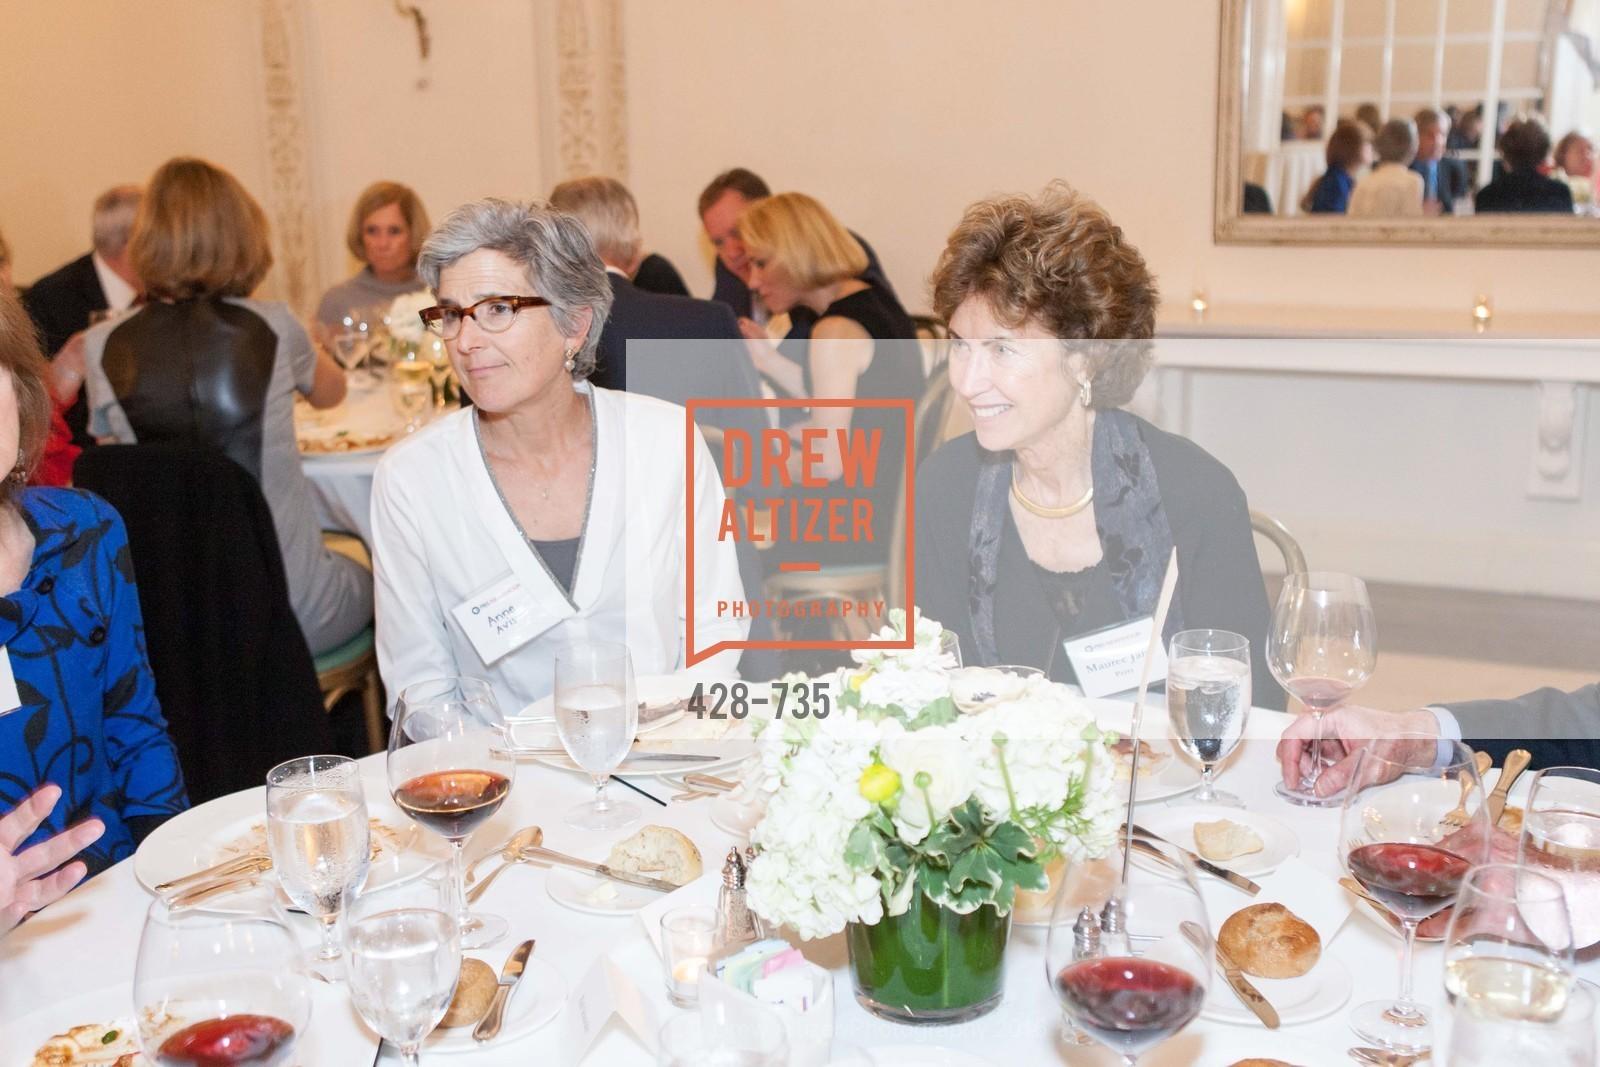 Anne Avis, Maureen Jane Perry, Photo #428-735